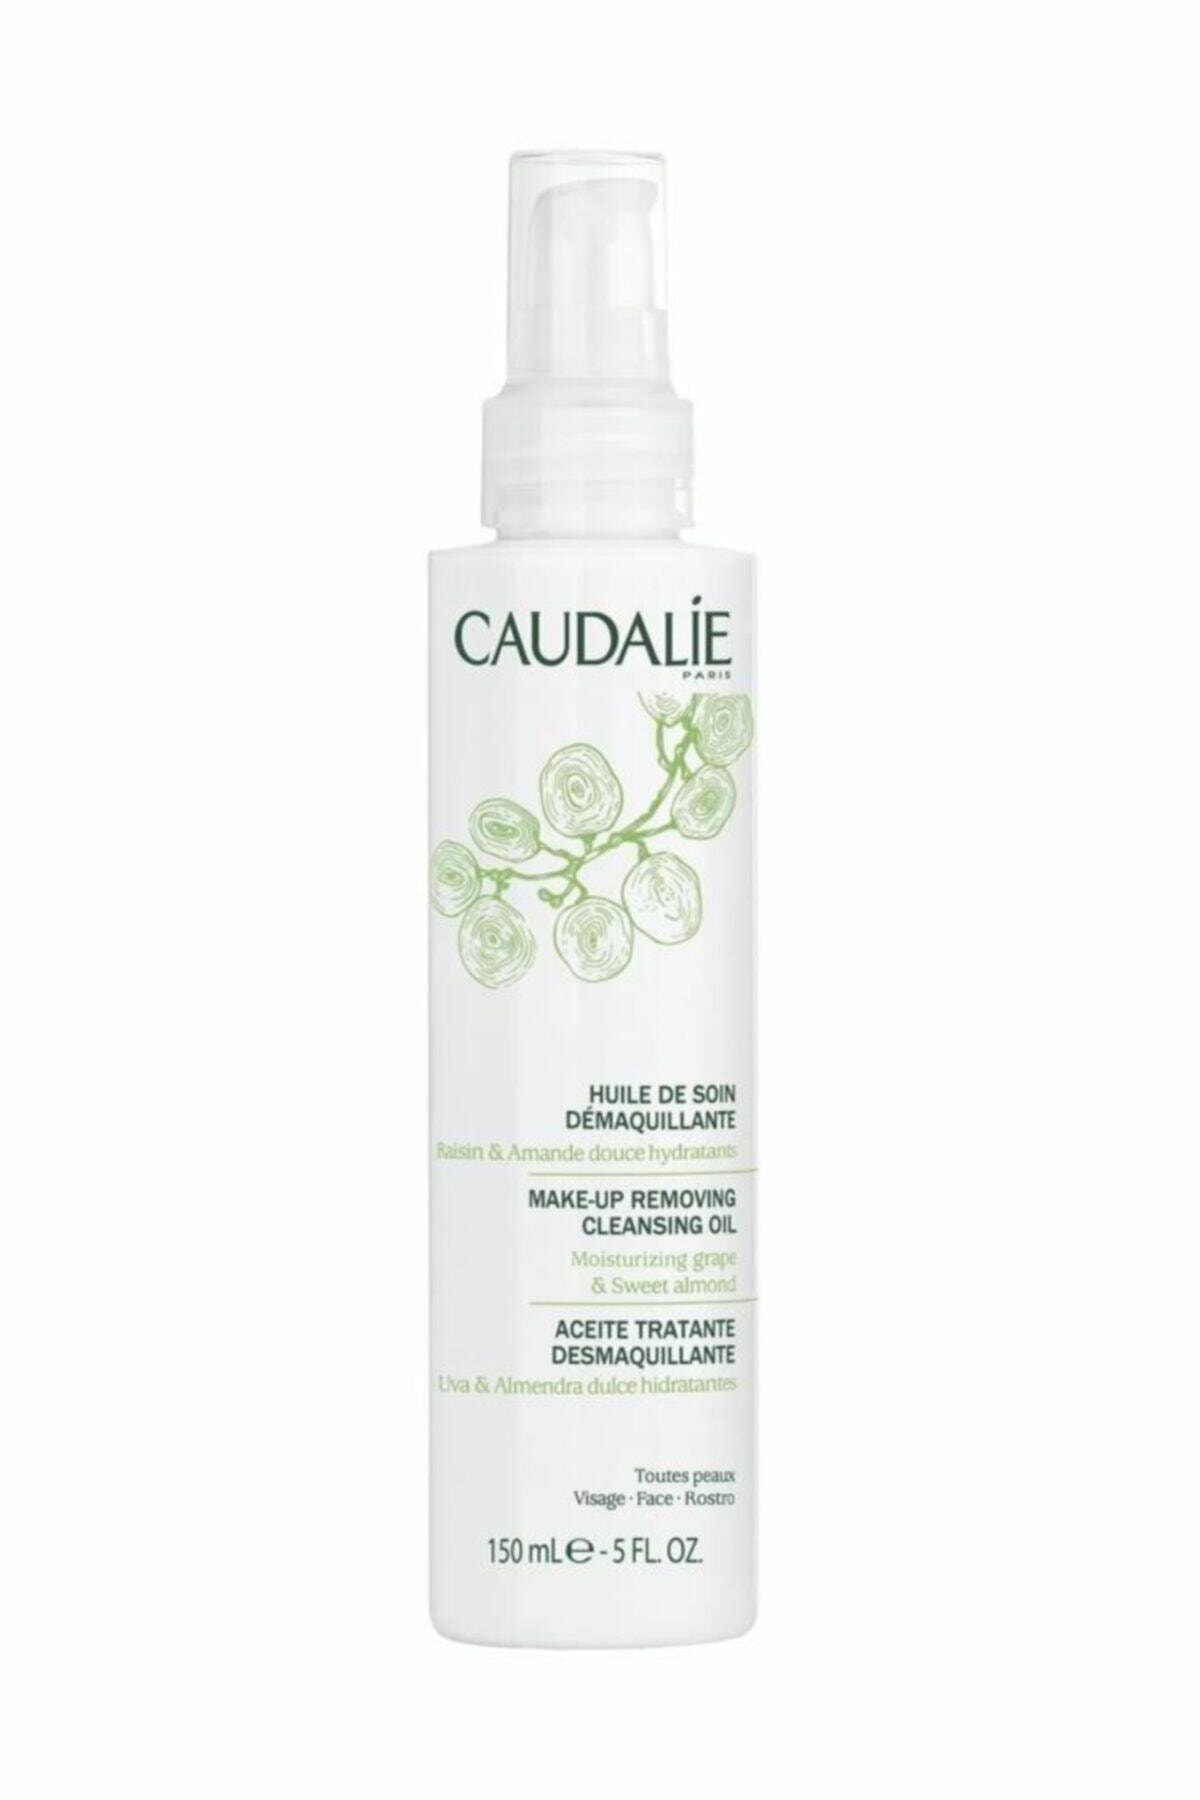 Caudalie Makyaj Temizleme Yağı - Make Up Removing Cleansing Oil 150 ml 3522931002351 1